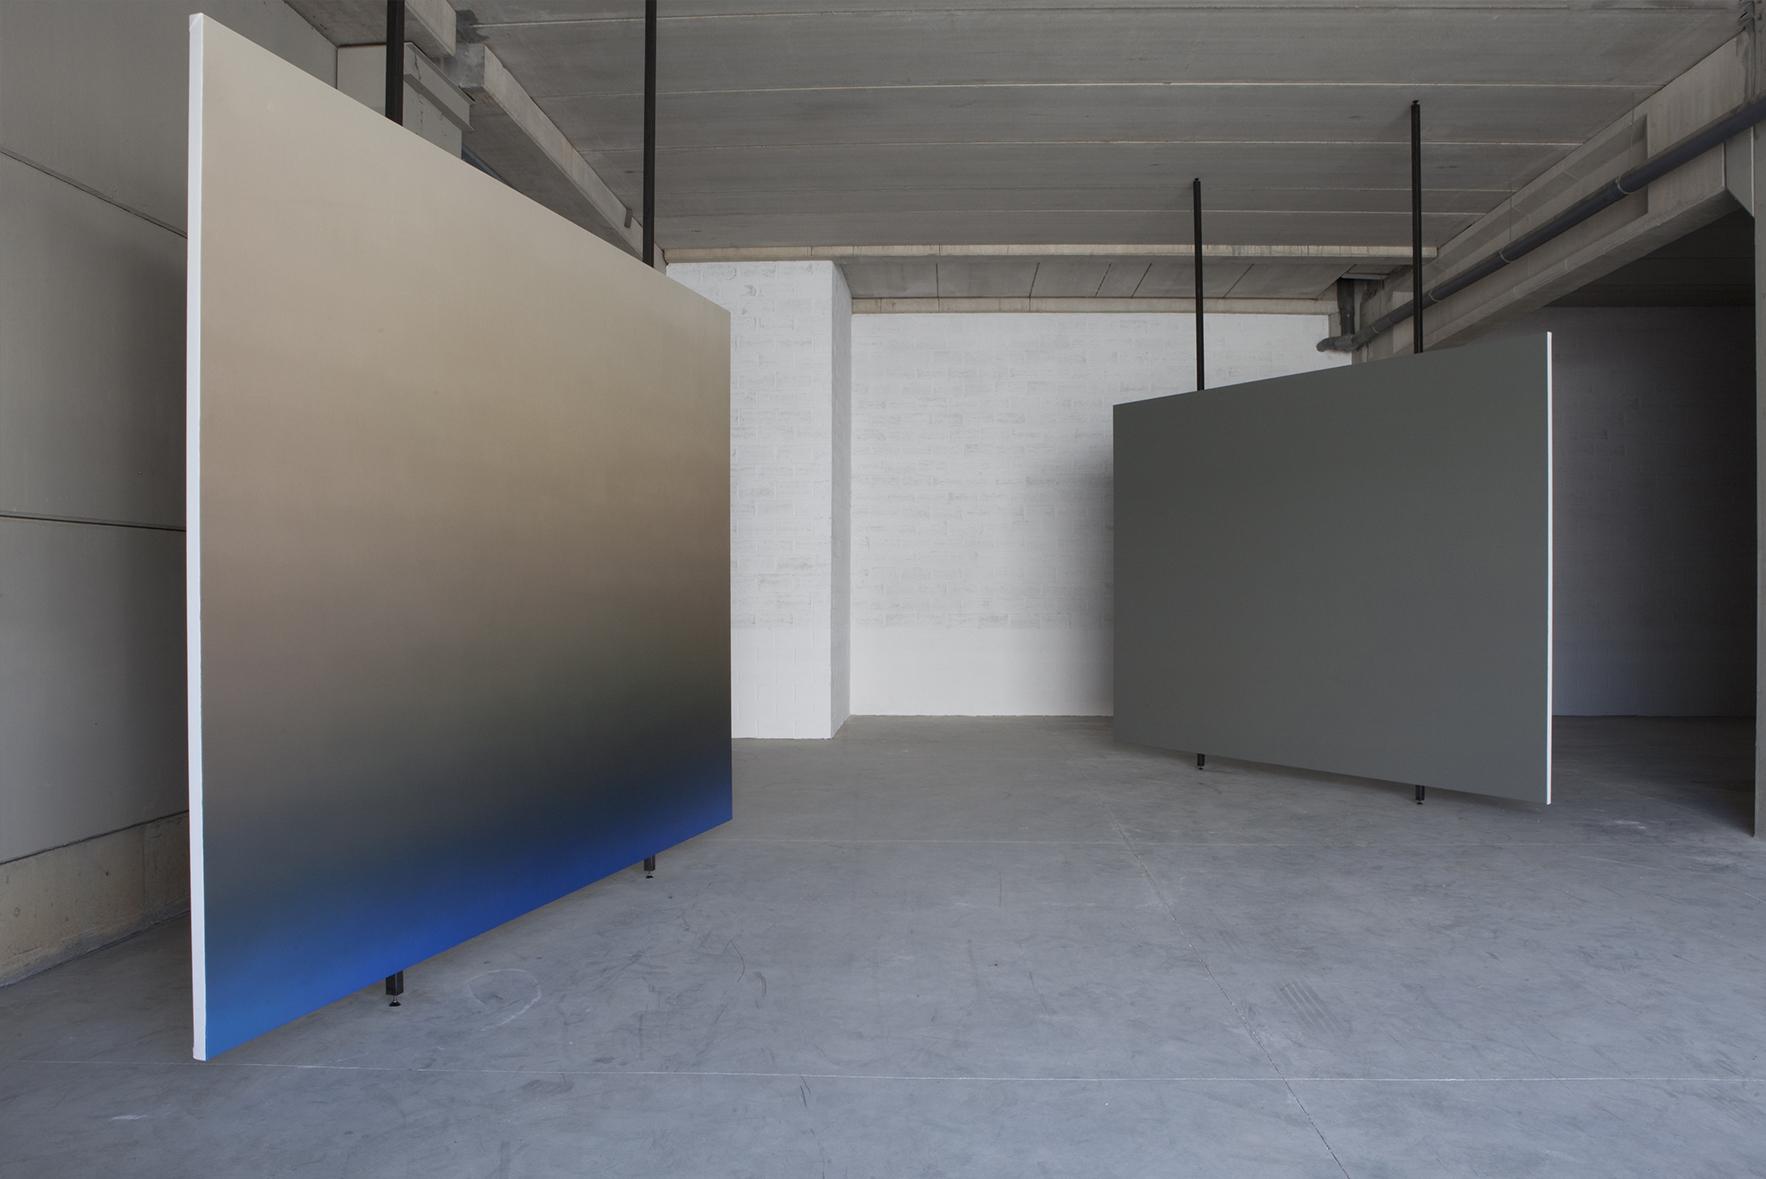 Untitled (Urdaibai), 2012 |  | ProjecteSD